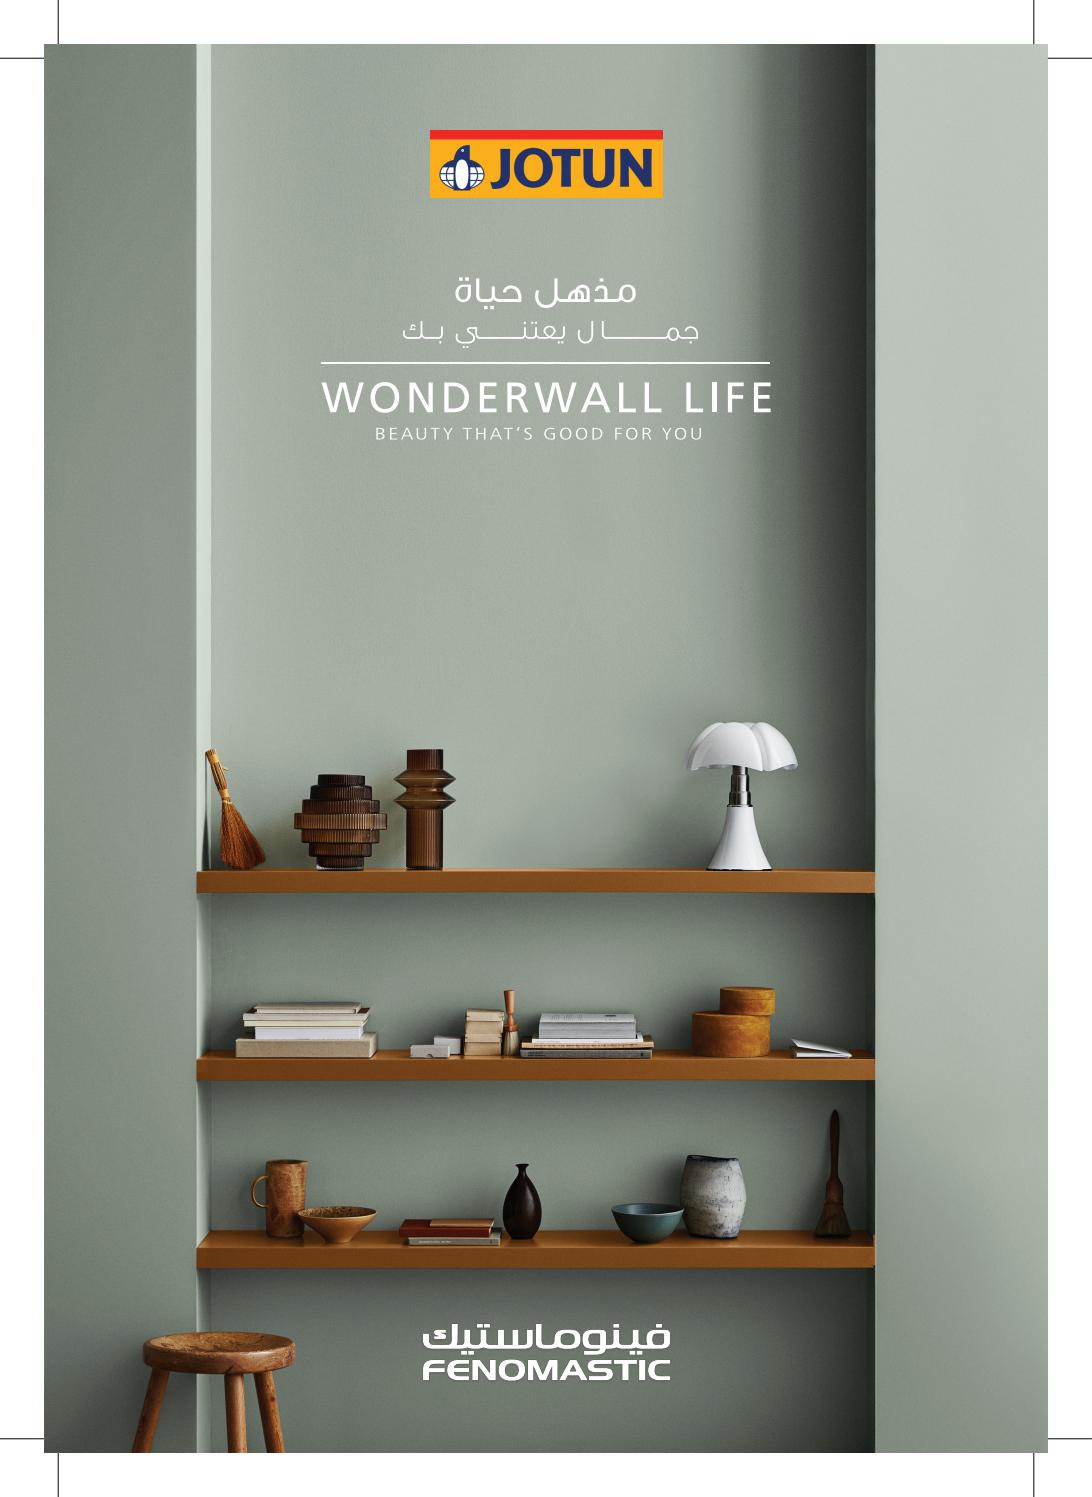 Fenomastic Wonderwall Life